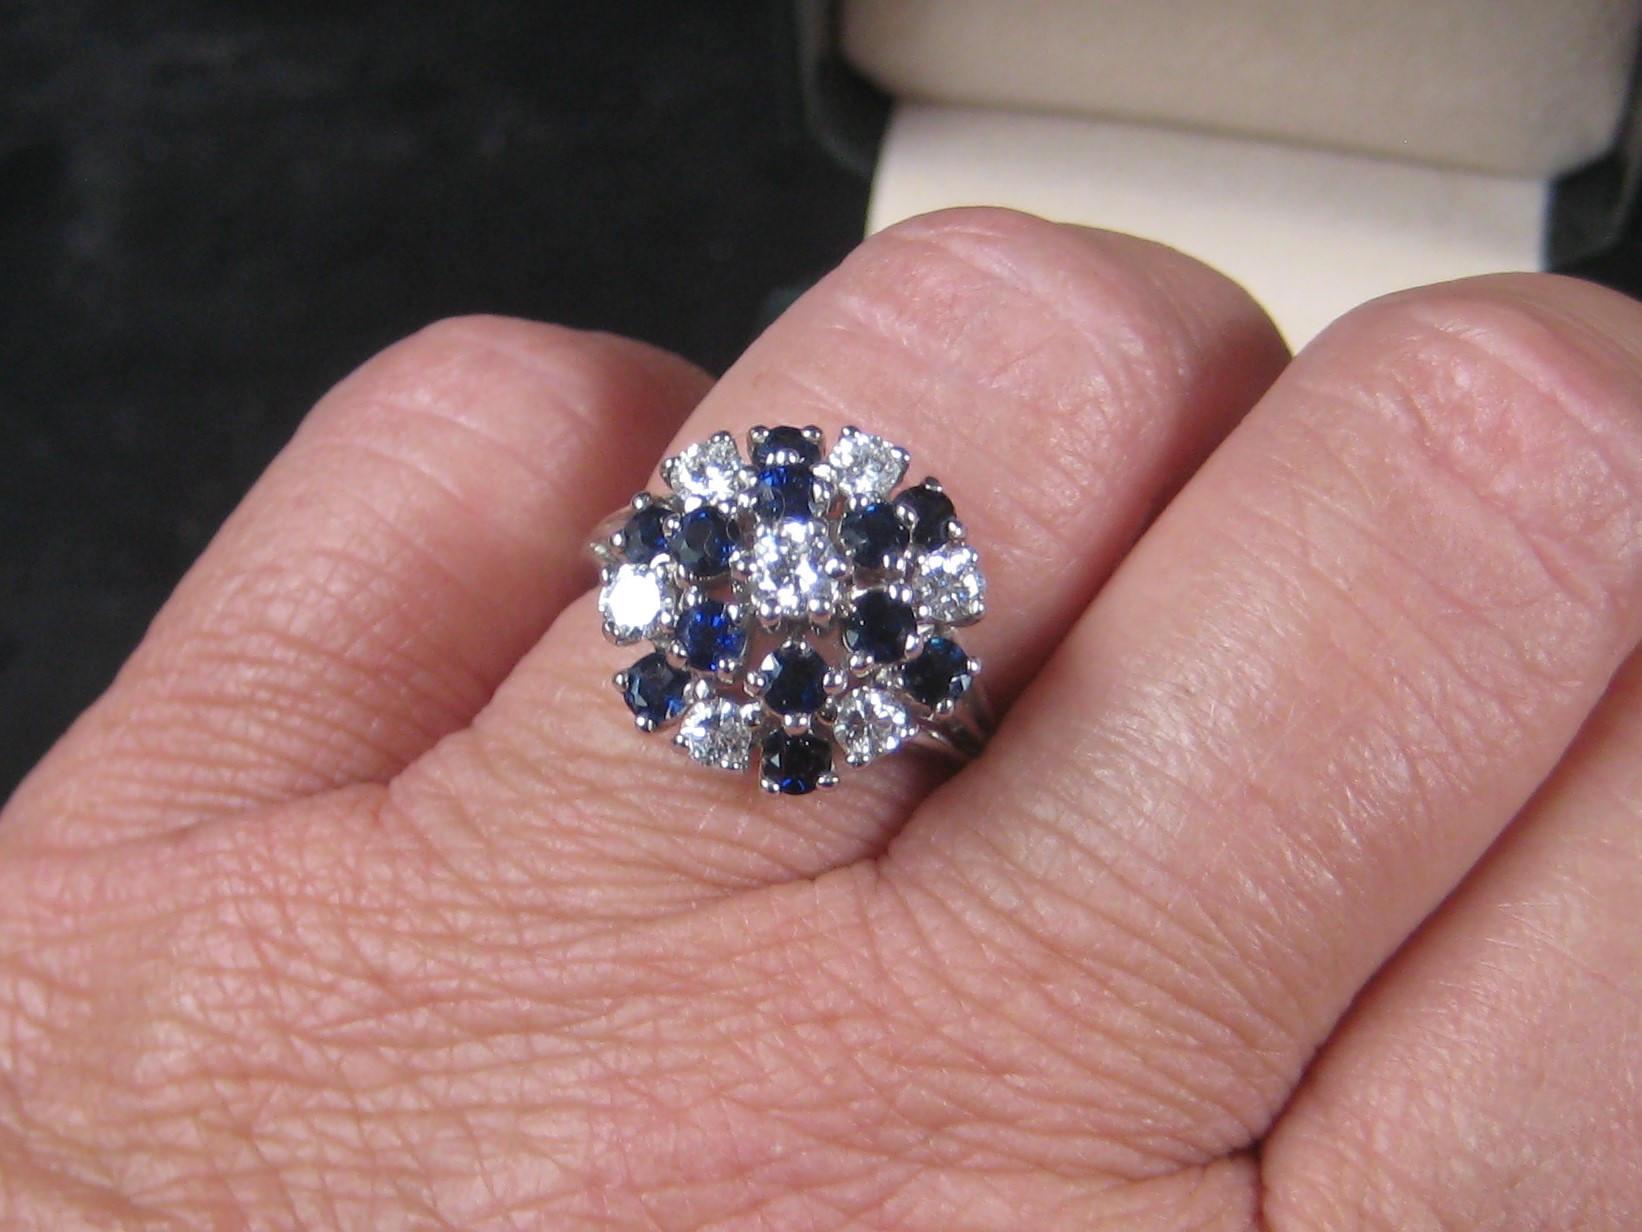 Dress Up Your Finger fabulous 14K White Gold Sapphire Cluster